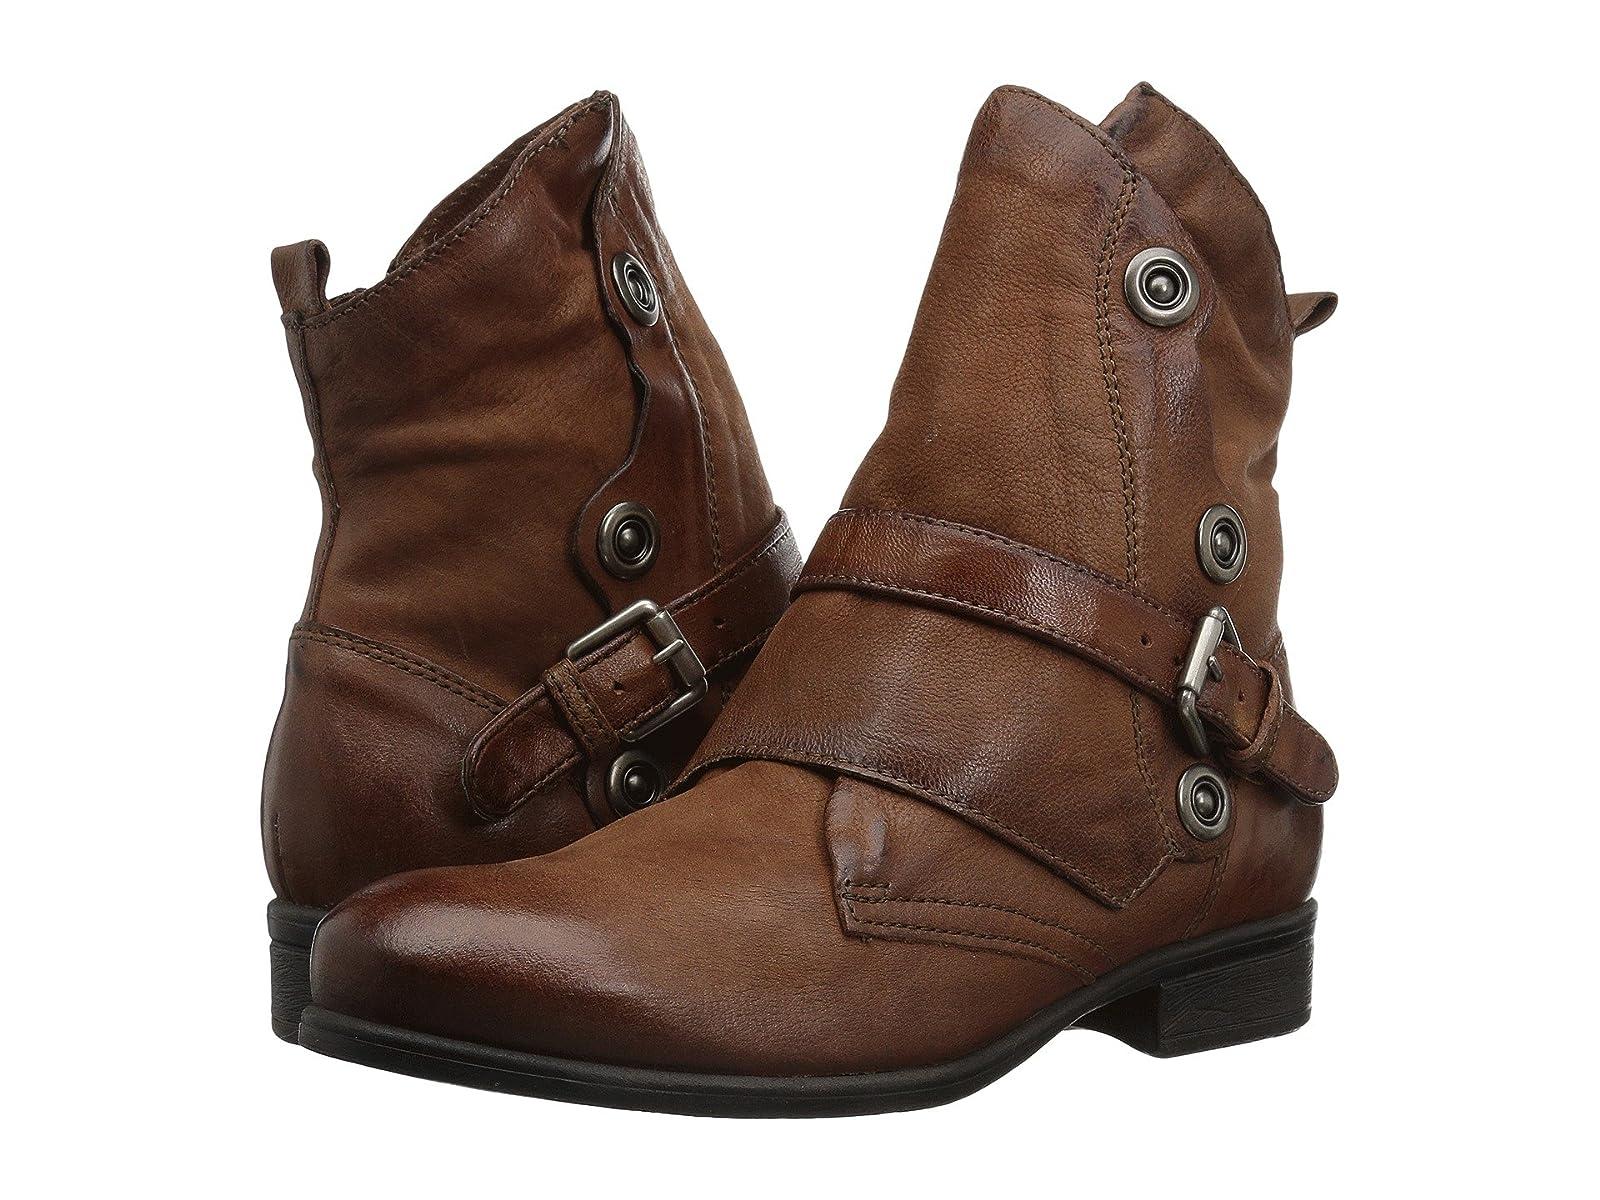 Miz Mooz SunnysideCheap and distinctive eye-catching shoes